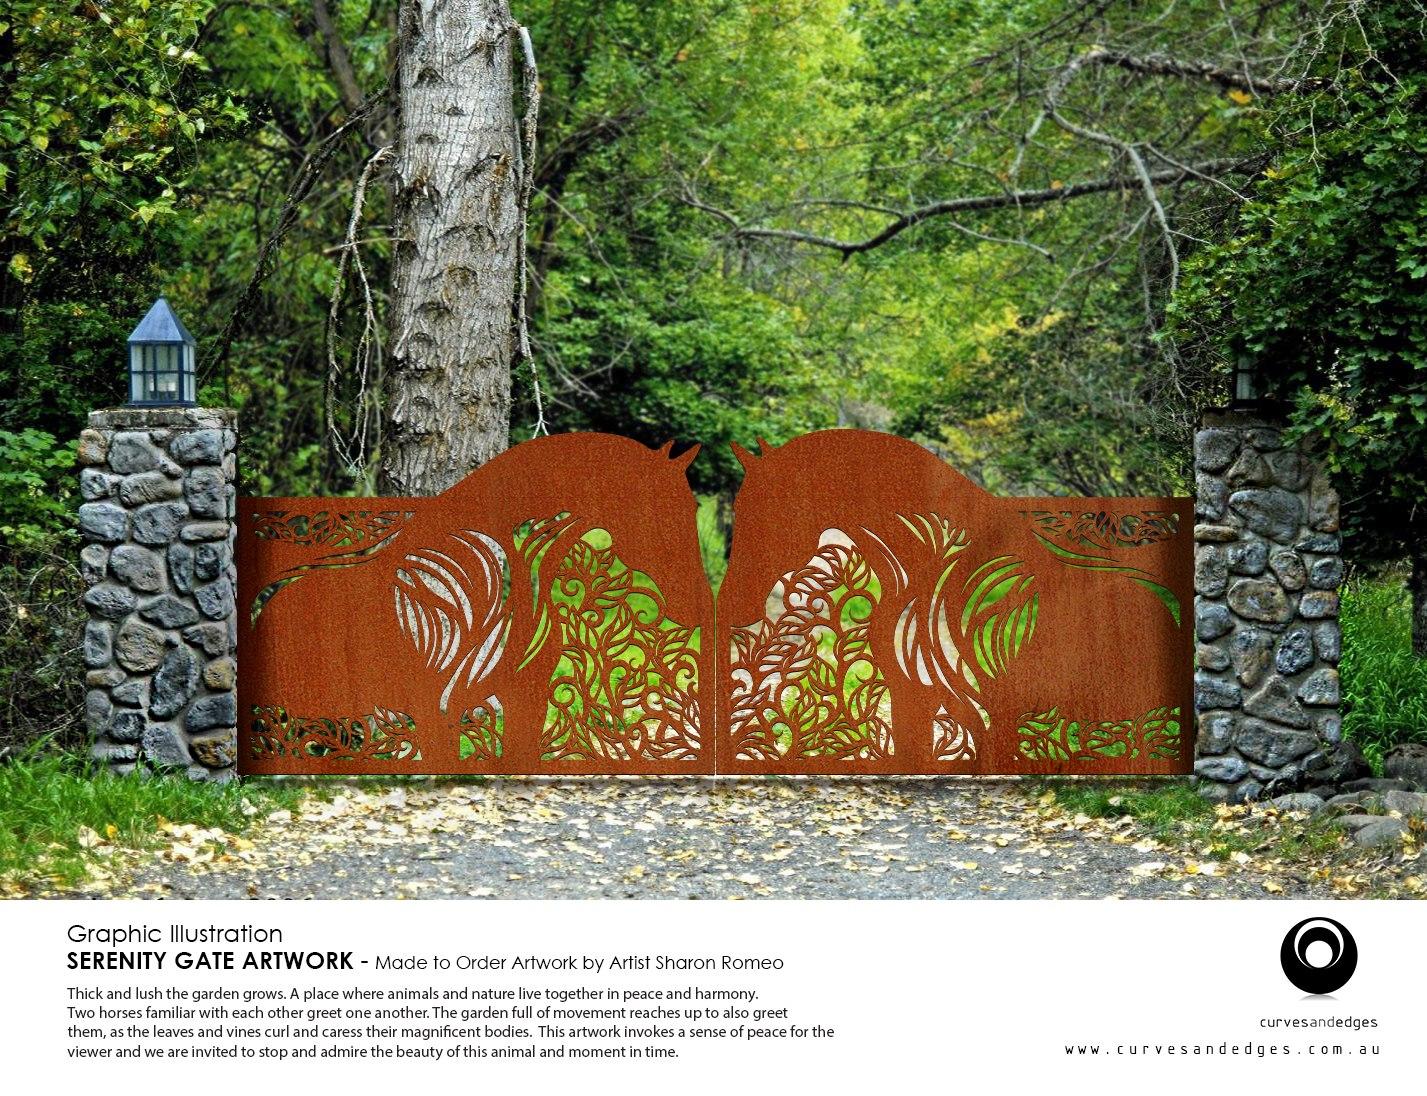 Serenity Gate Artwork